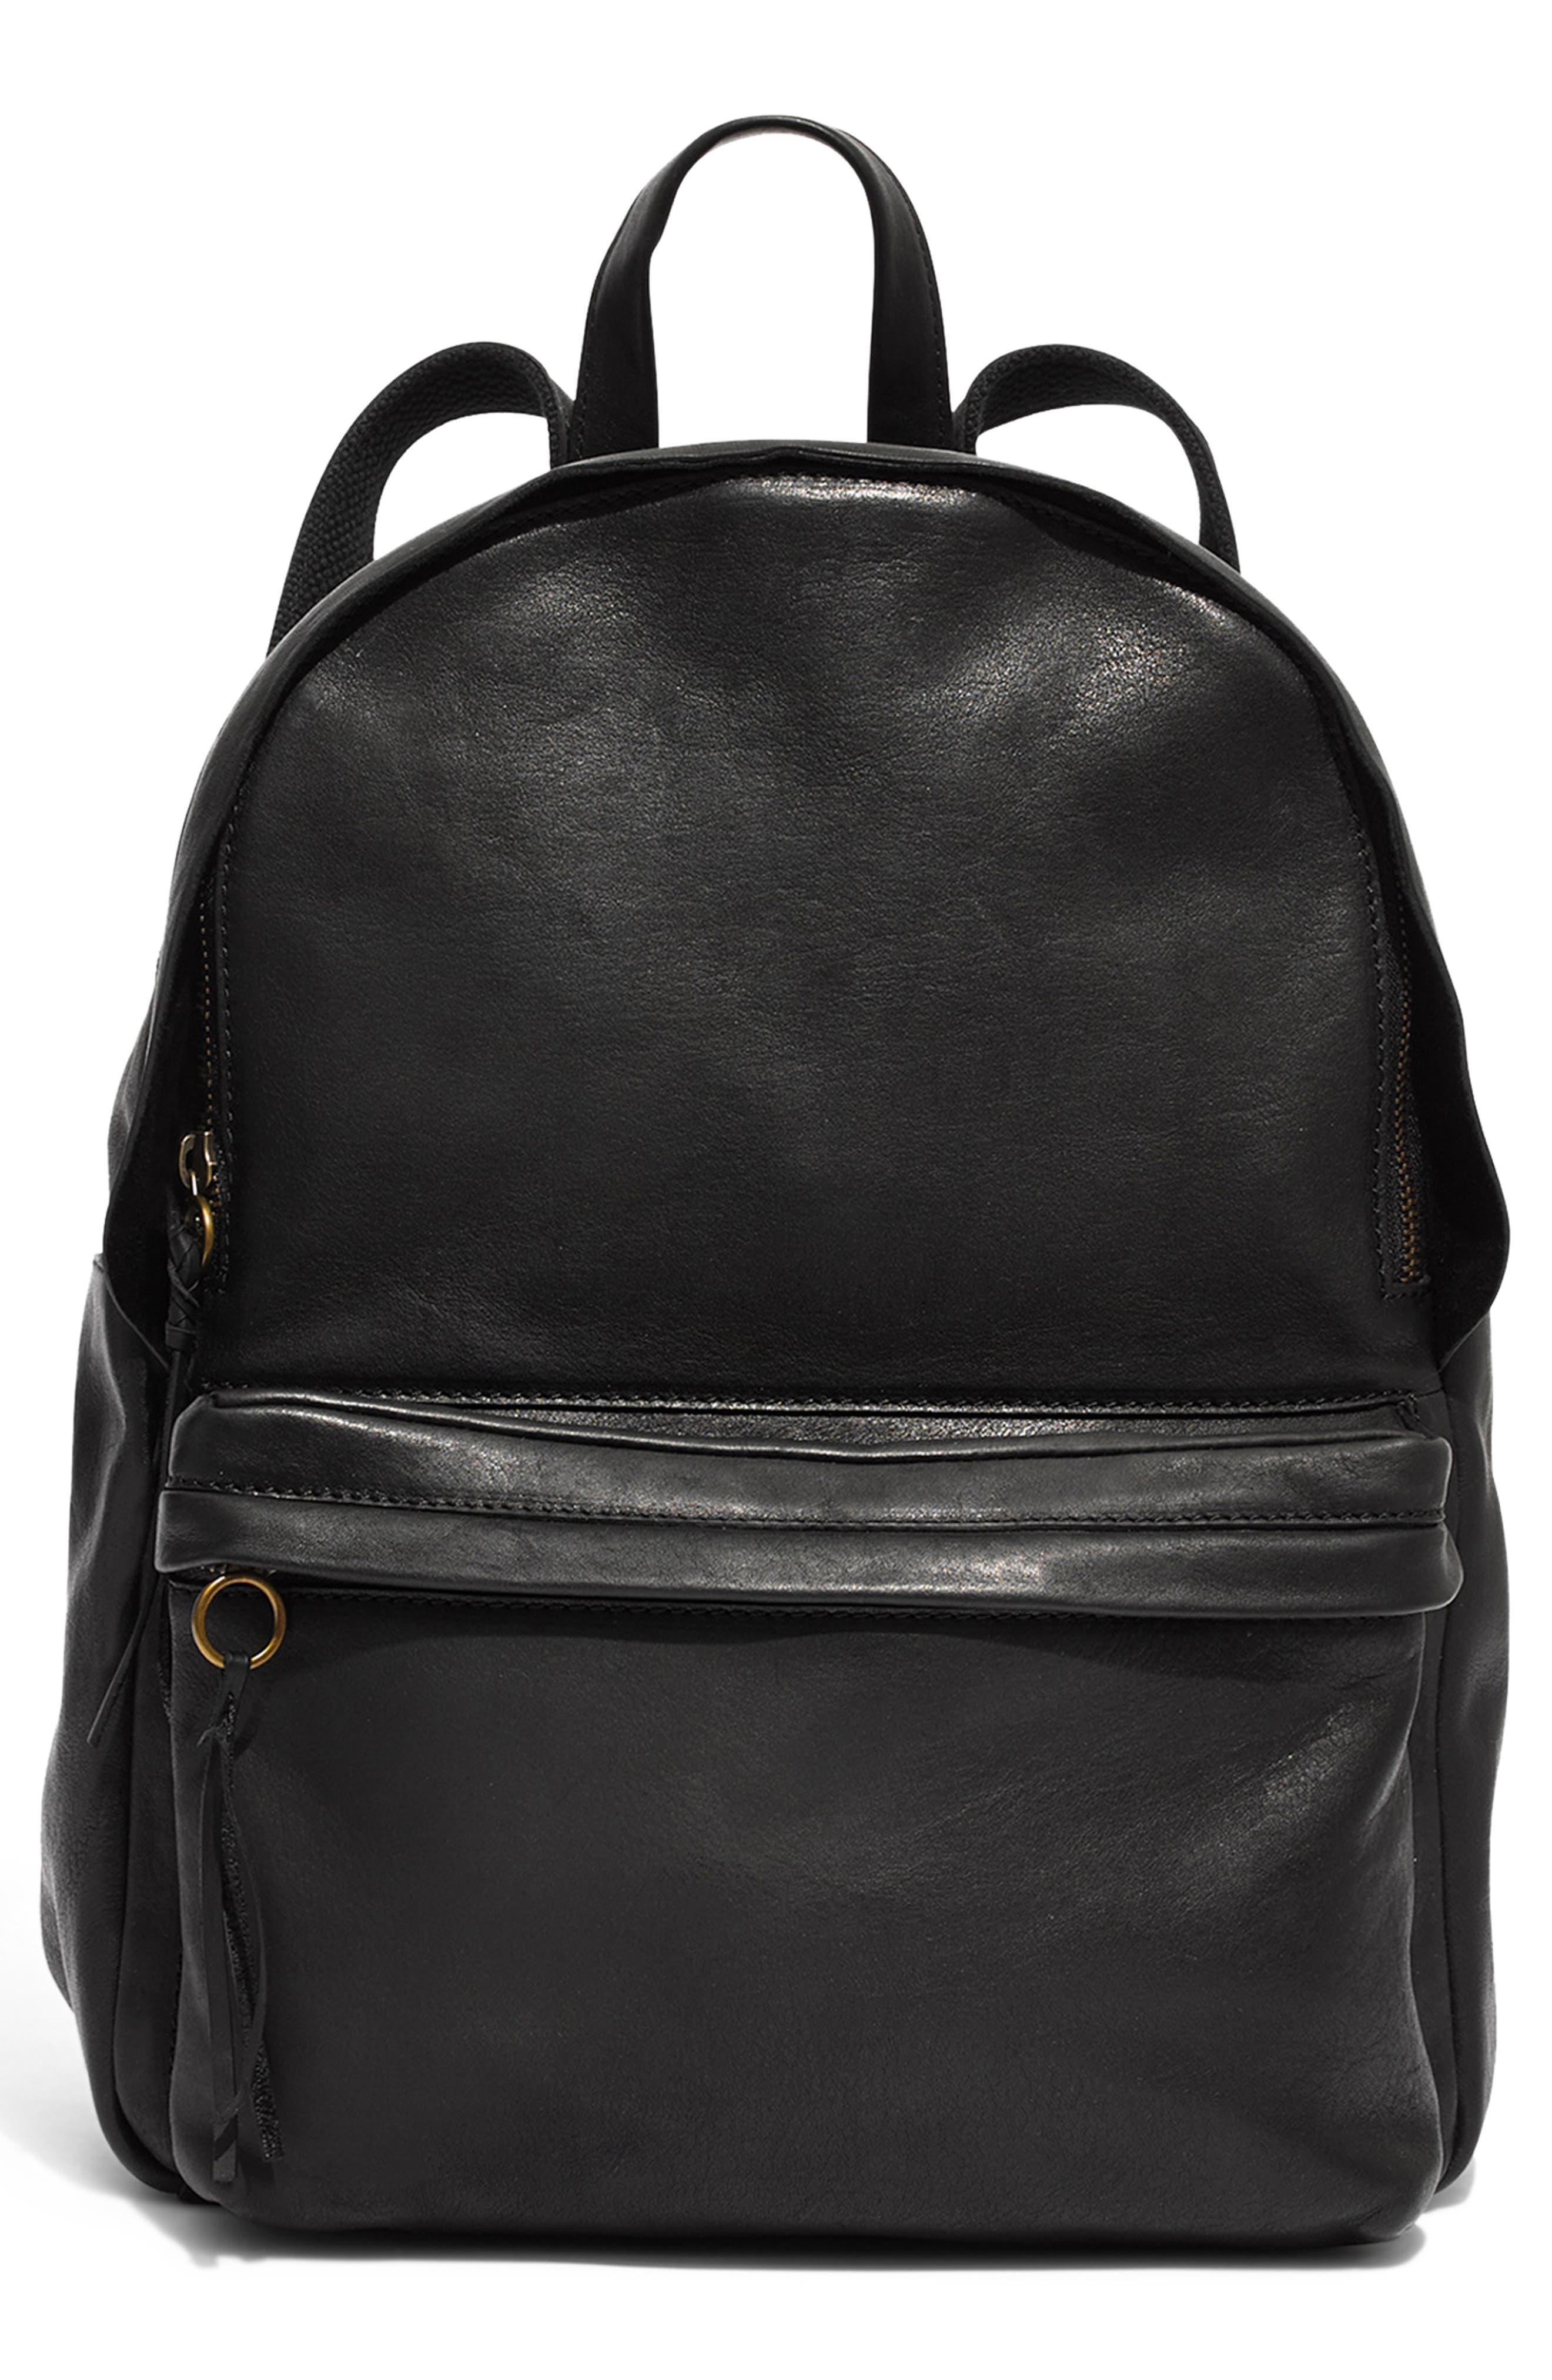 MADEWELL, Lorimer Leather Backpack, Main thumbnail 1, color, TRUE BLACK